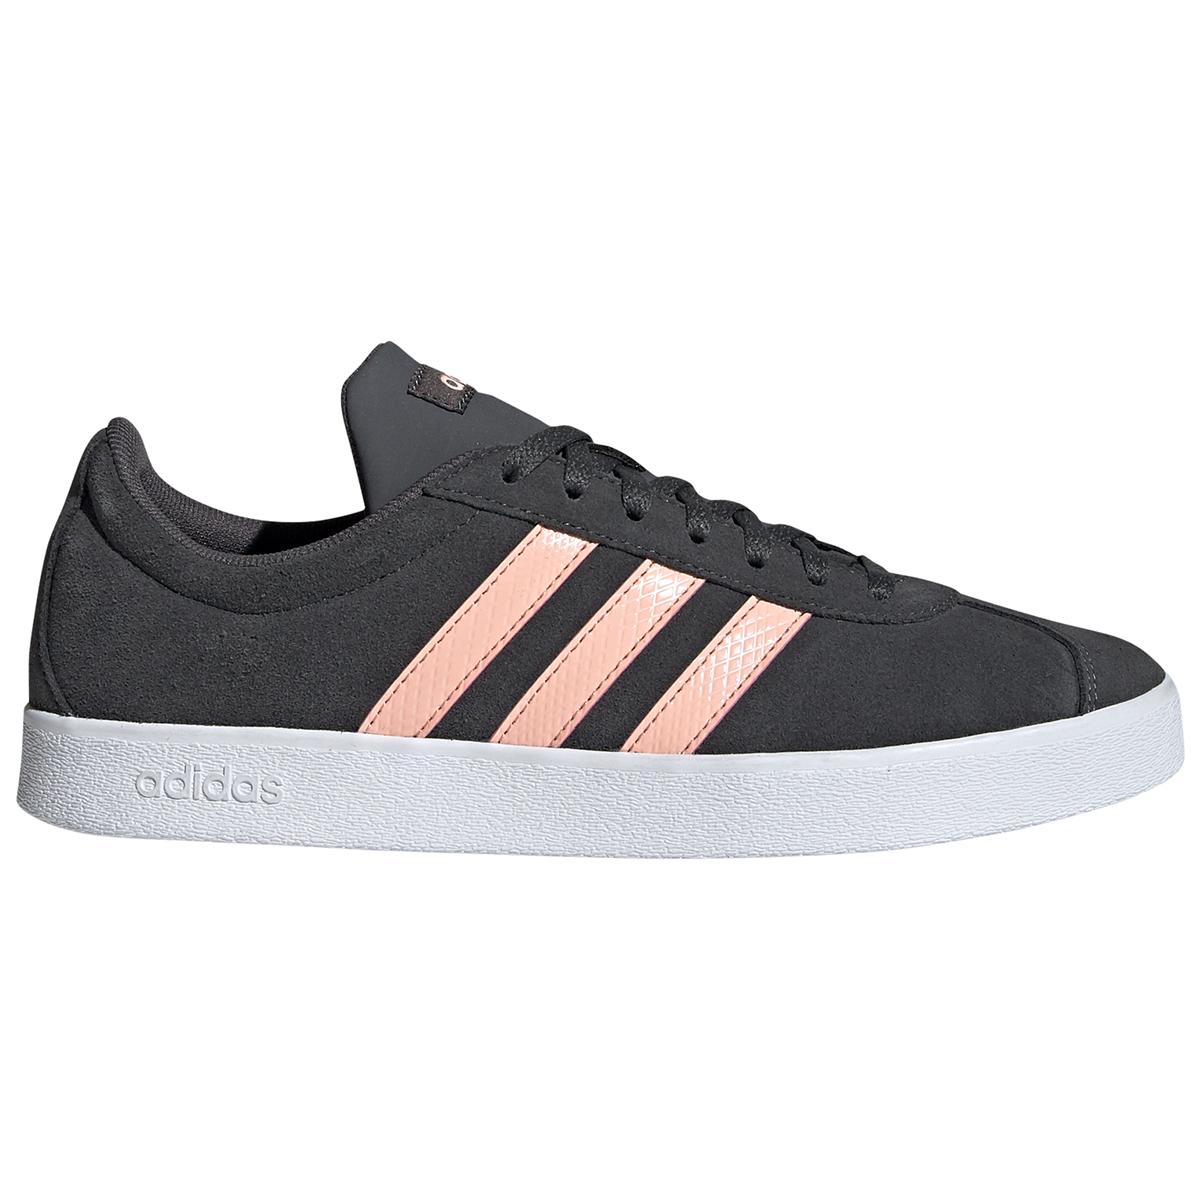 Adidas Women's Vl Court 2.0 Sneakers - Black, 9